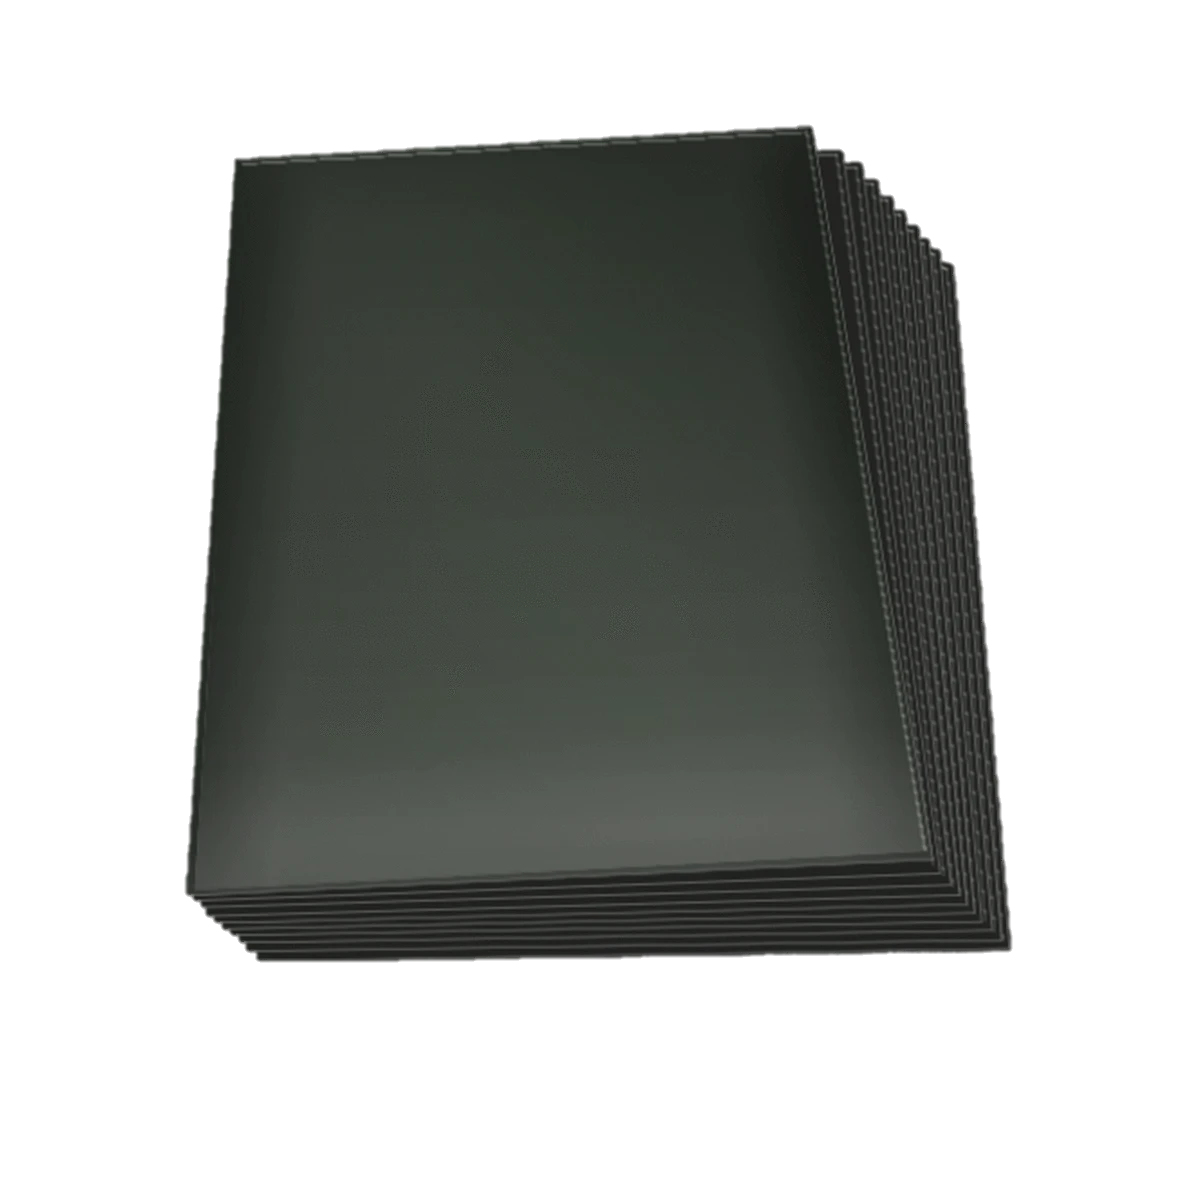 Set de 60 protectores Small Topdeck color negro.